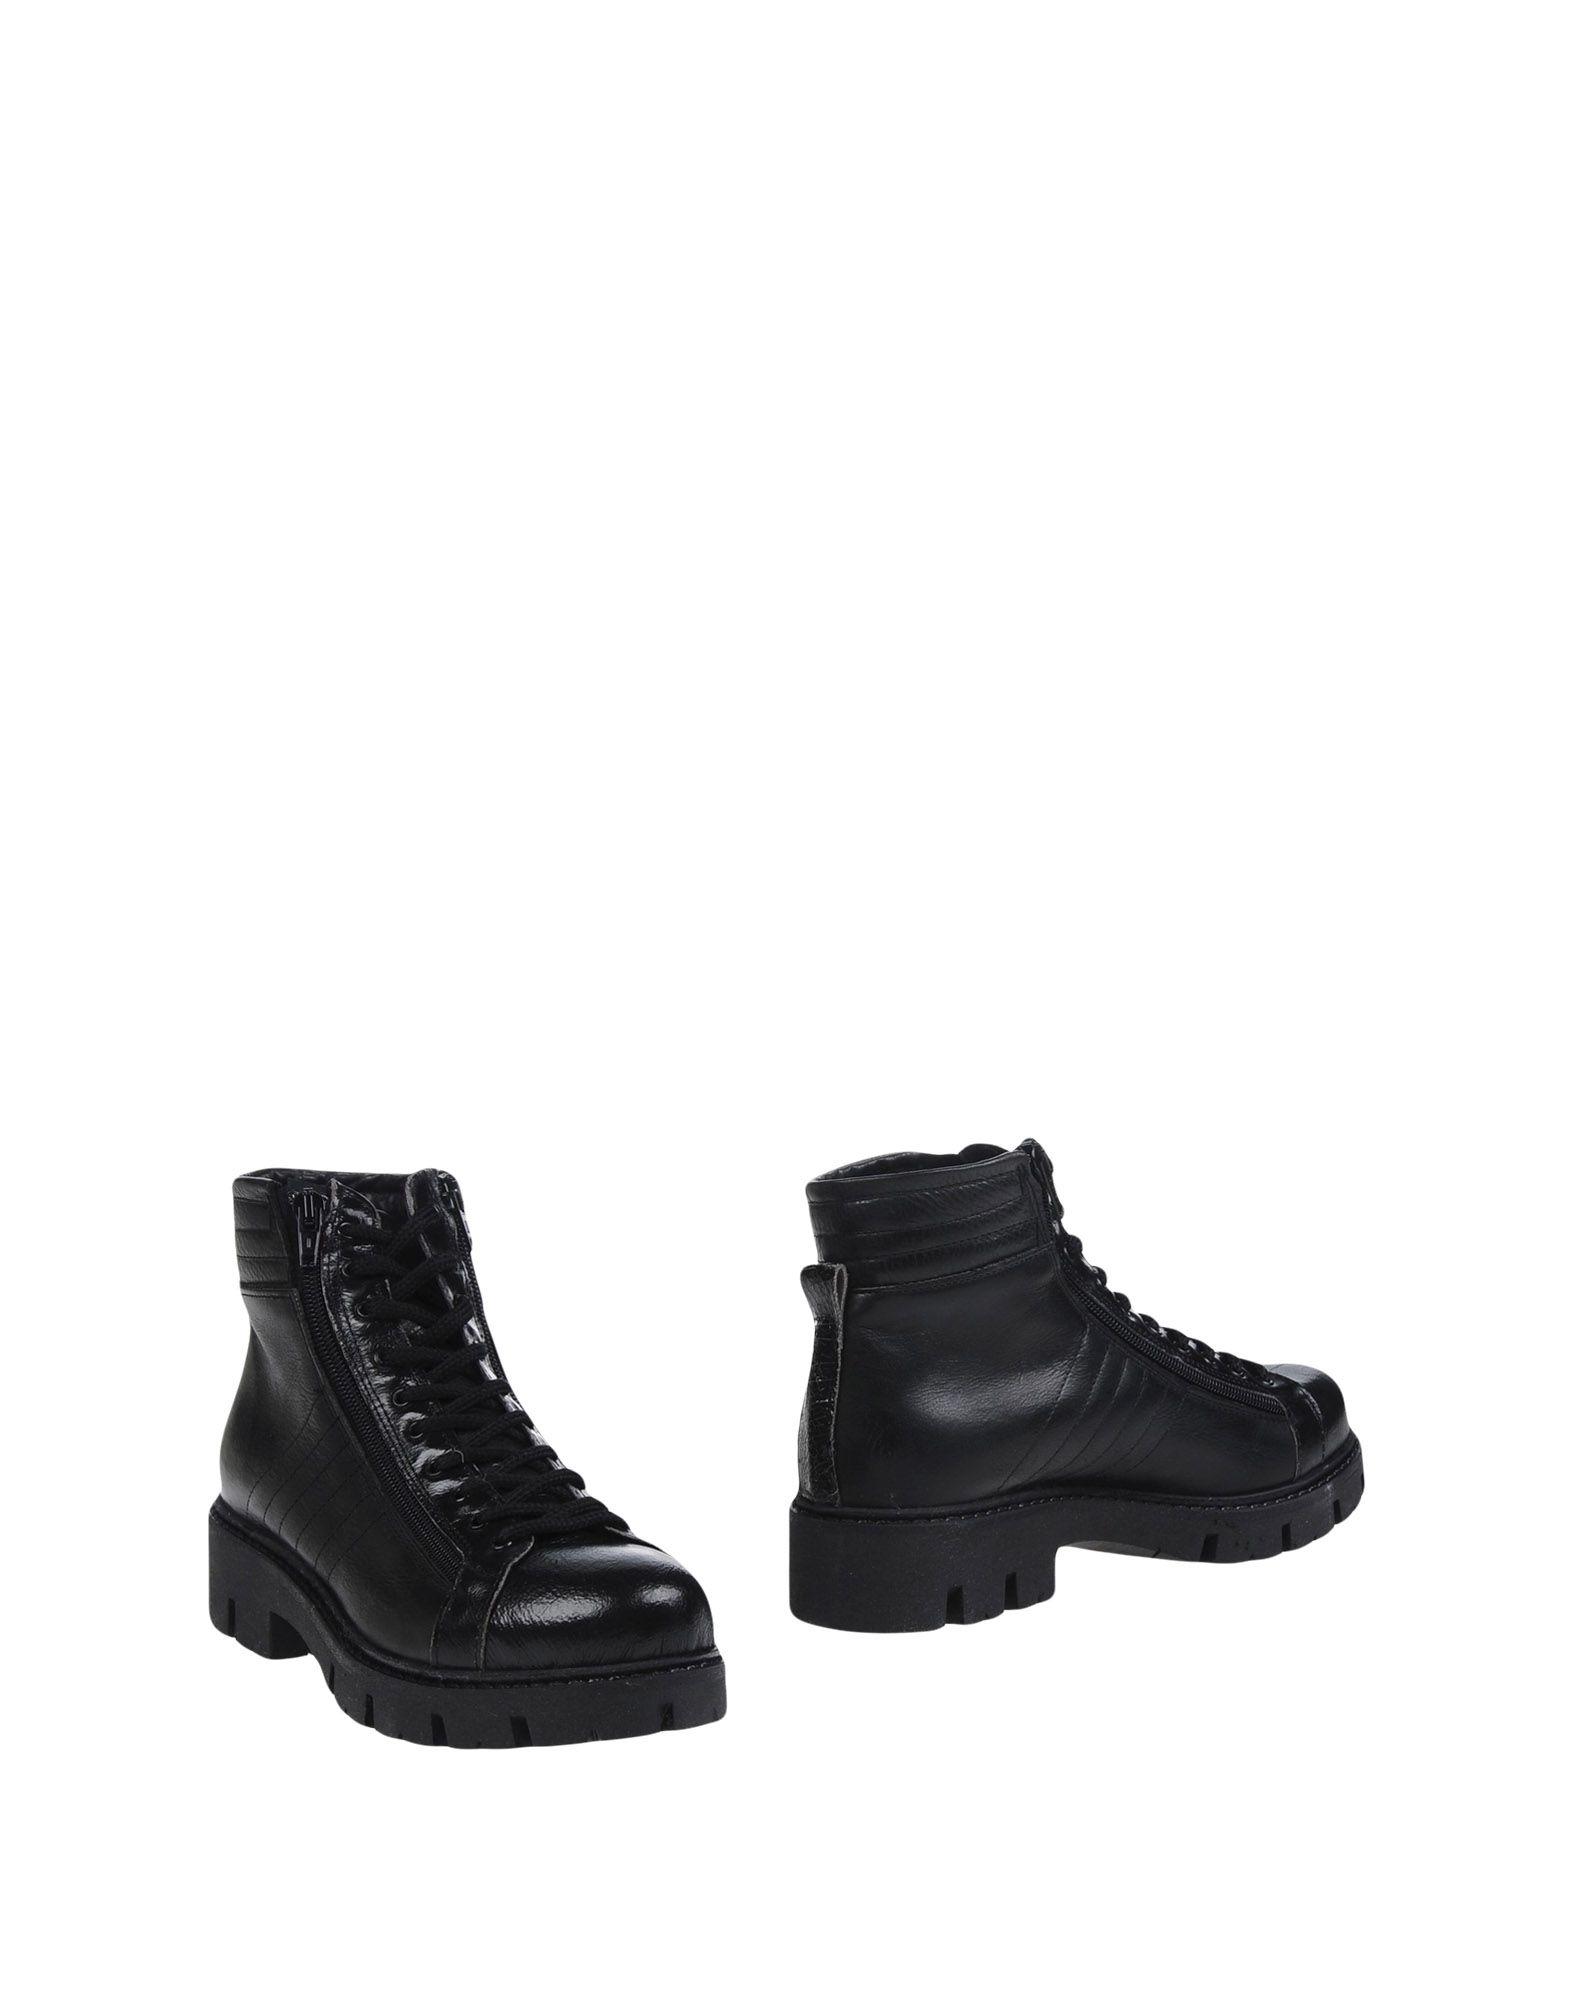 Nila & Nila Stiefelette Damen  11265426XS Gute Qualität beliebte Schuhe